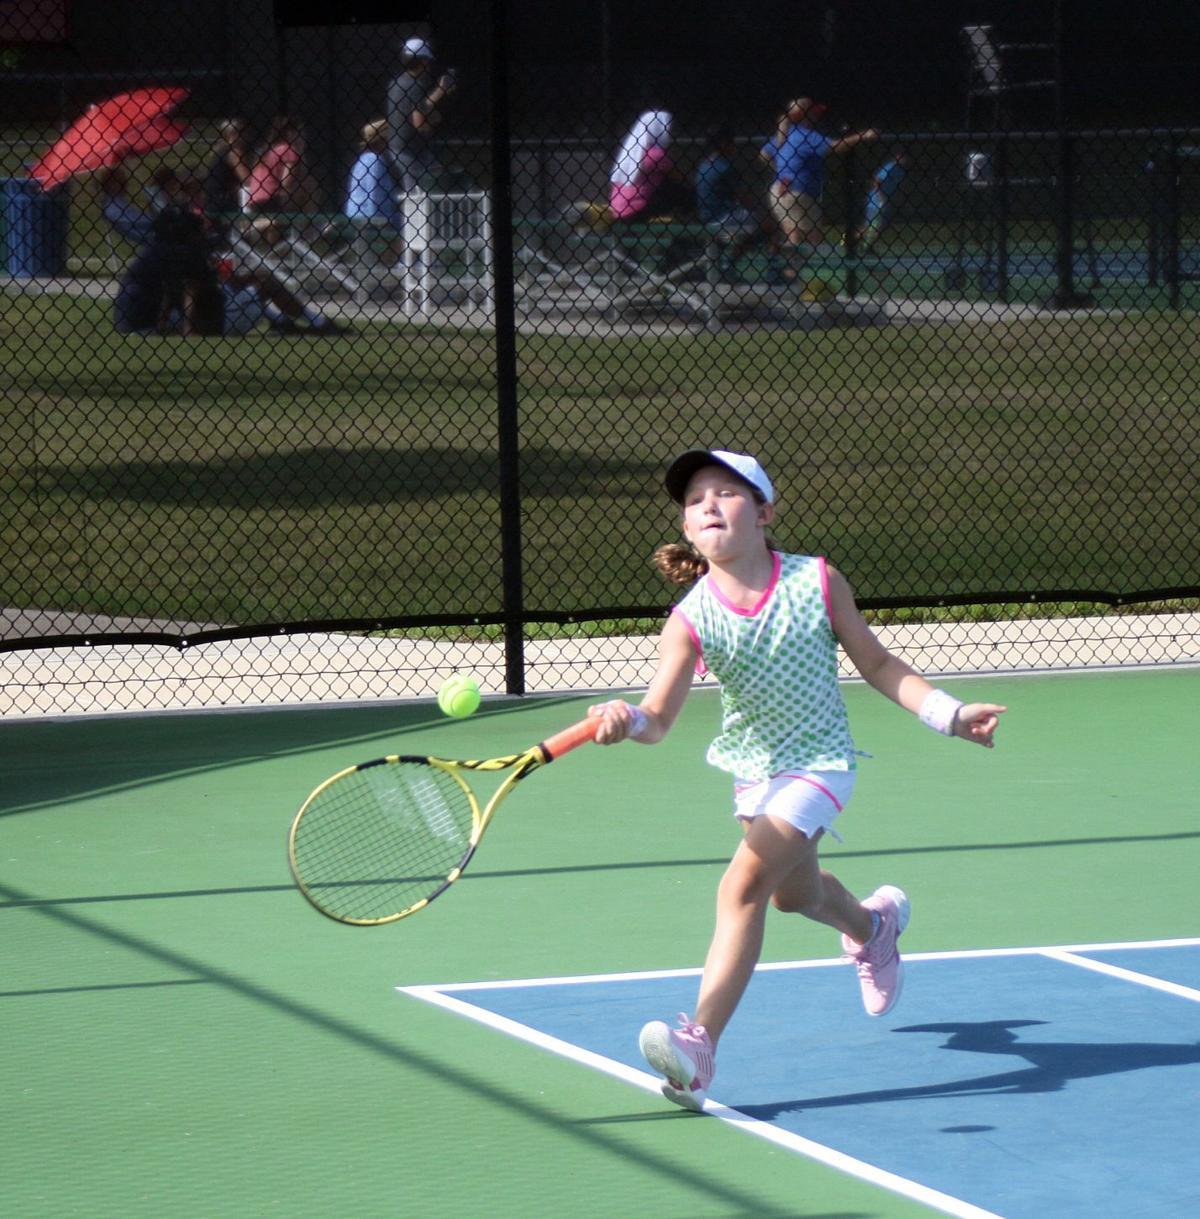 071519_RNT_TennisA.jpg